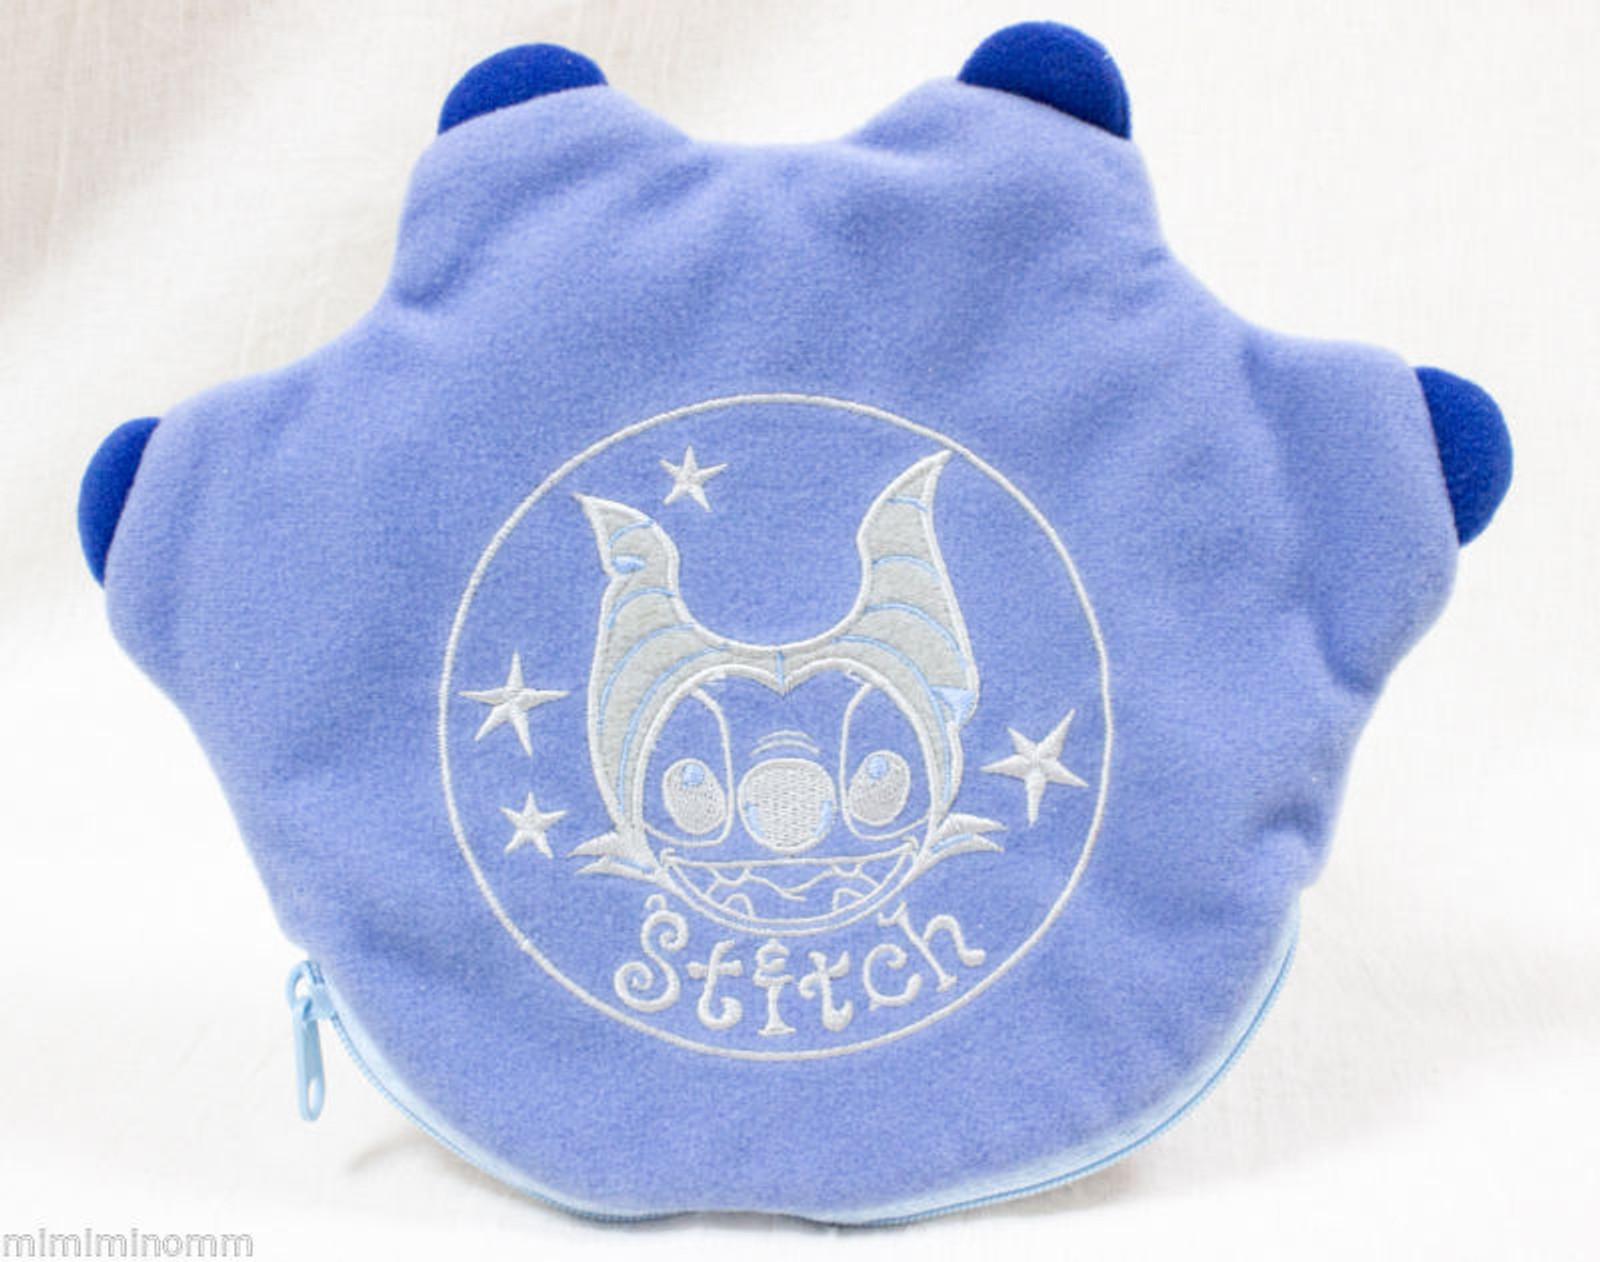 Disney Stitch Mini Pouch Bag Sole of the Hand Ver. Banpresto JAPAN ANIME